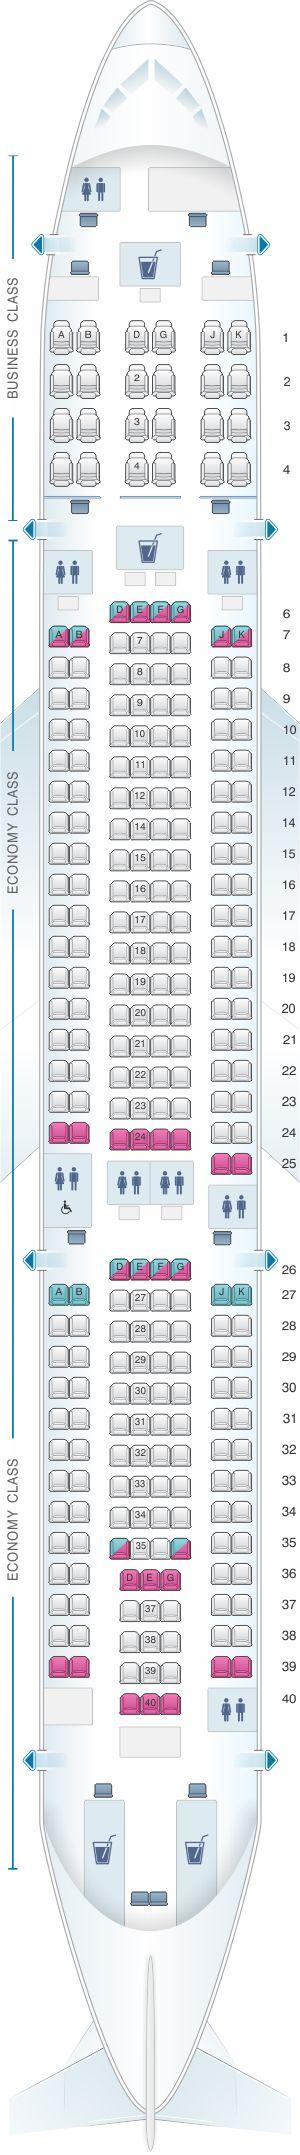 Seat Map Fiji Airways Airbus A330 200